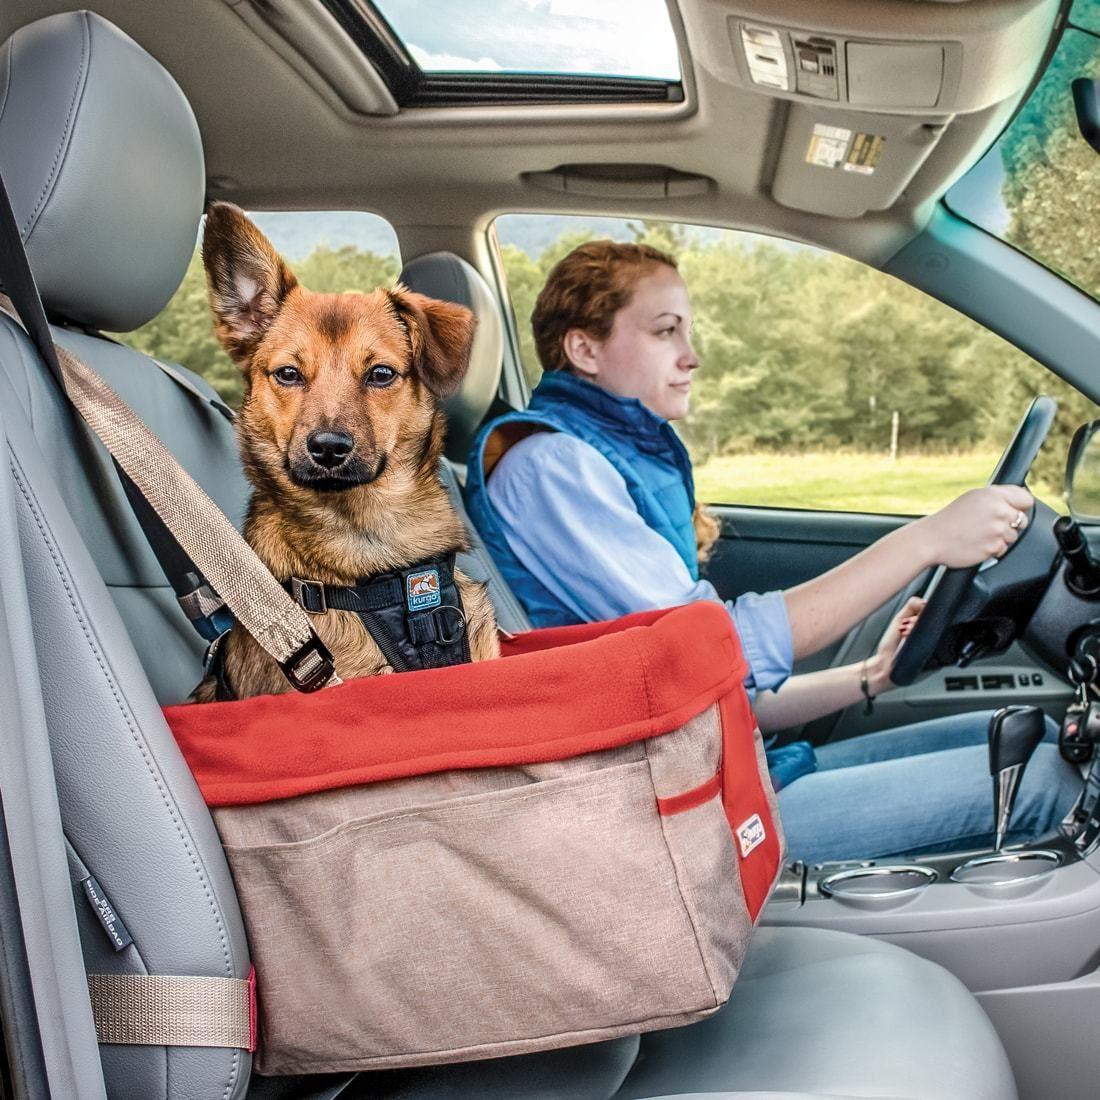 Heather Dog Booster Seat Dog Car Seats Pet Car Seat Covers Dog